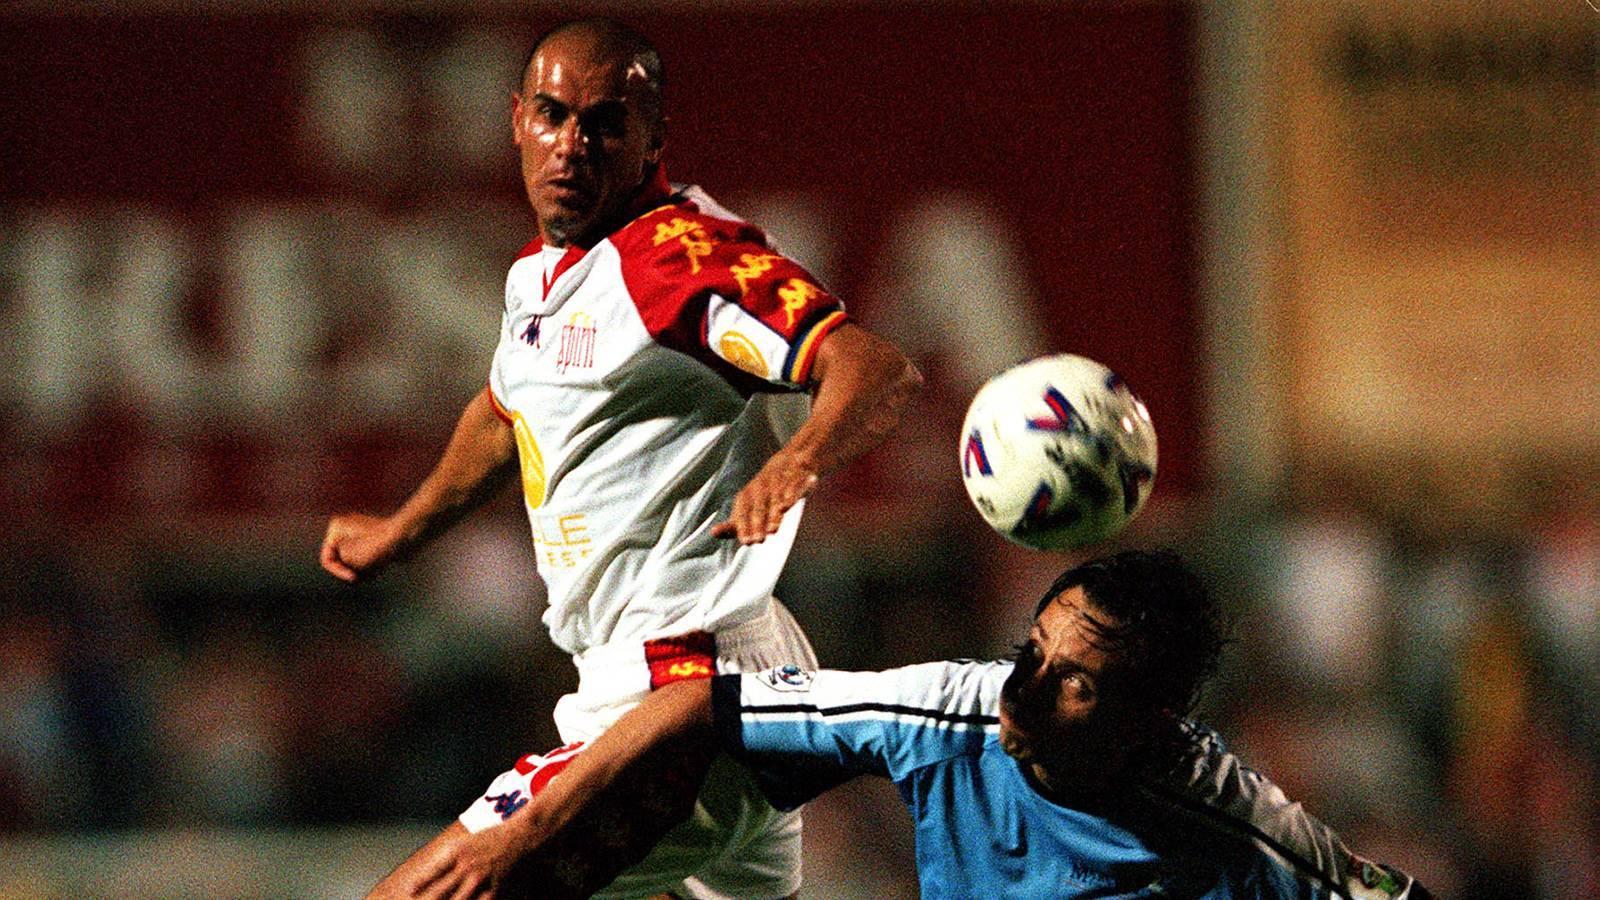 Former Socceroo eyes coaching return